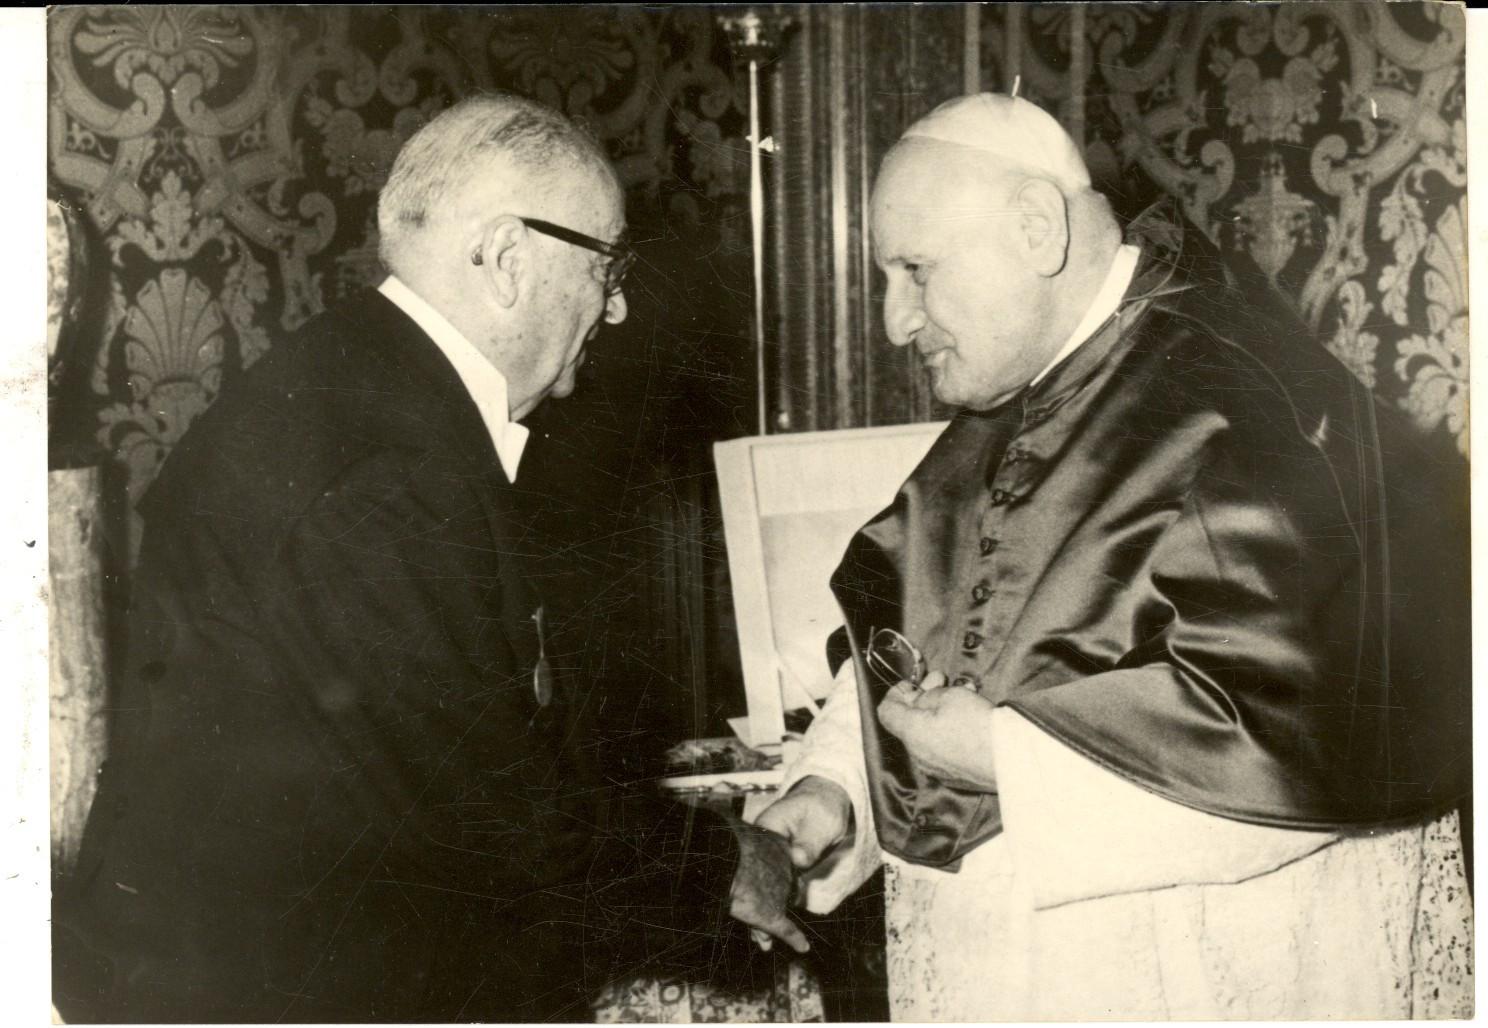 Президент Турции Баяр и папа Иоанн XXIII